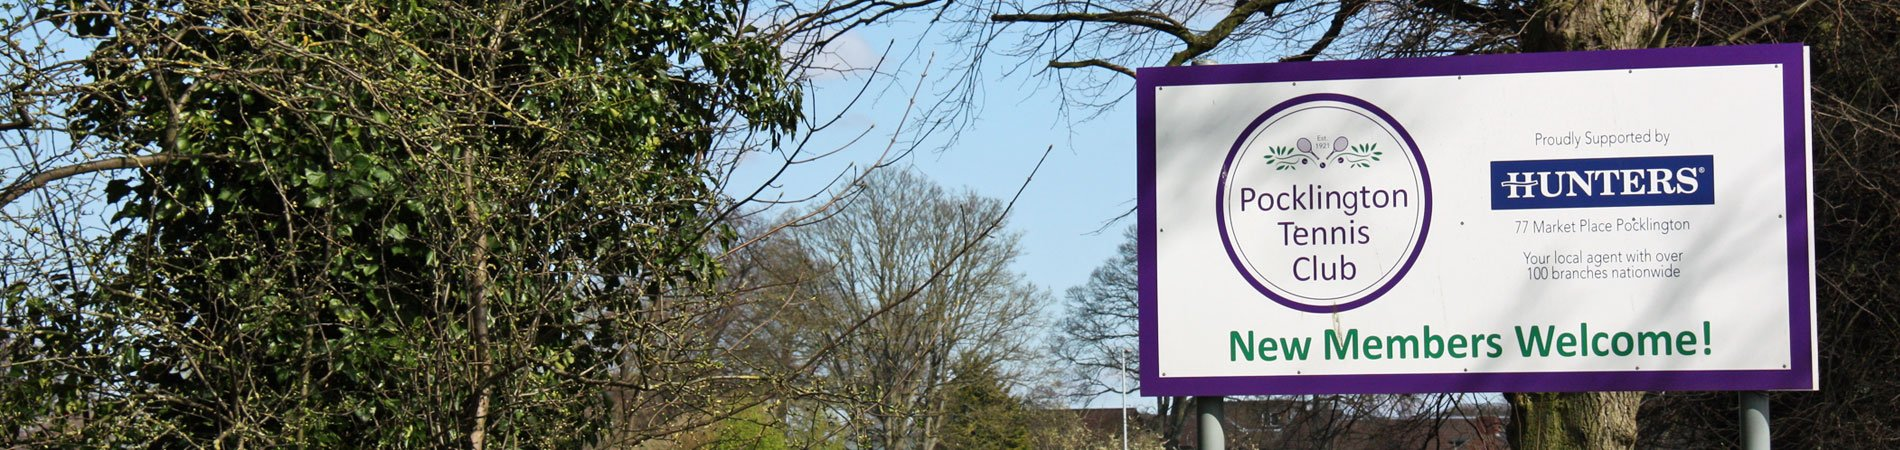 The roadside sign for Pocklington Tennis Club